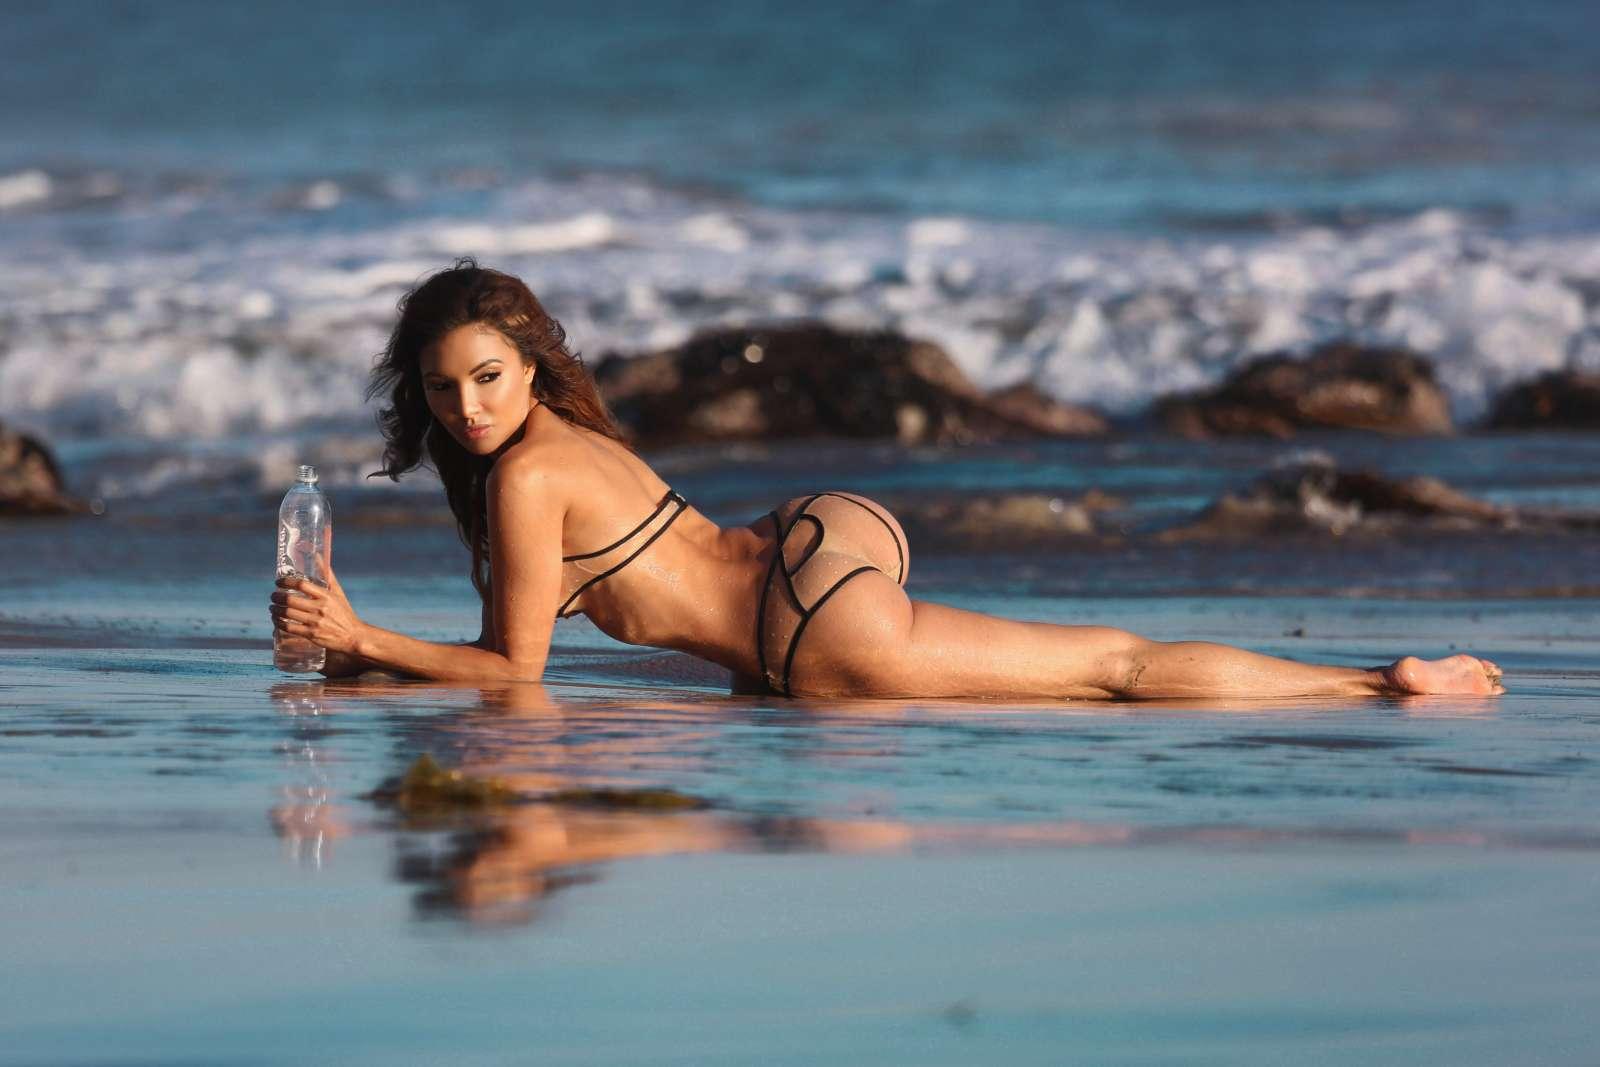 Lexy – 138 Water Bikini Photoshoot in Malibu | Indian Girls Villa - Celebs Beauty, Fashion and Entertainment